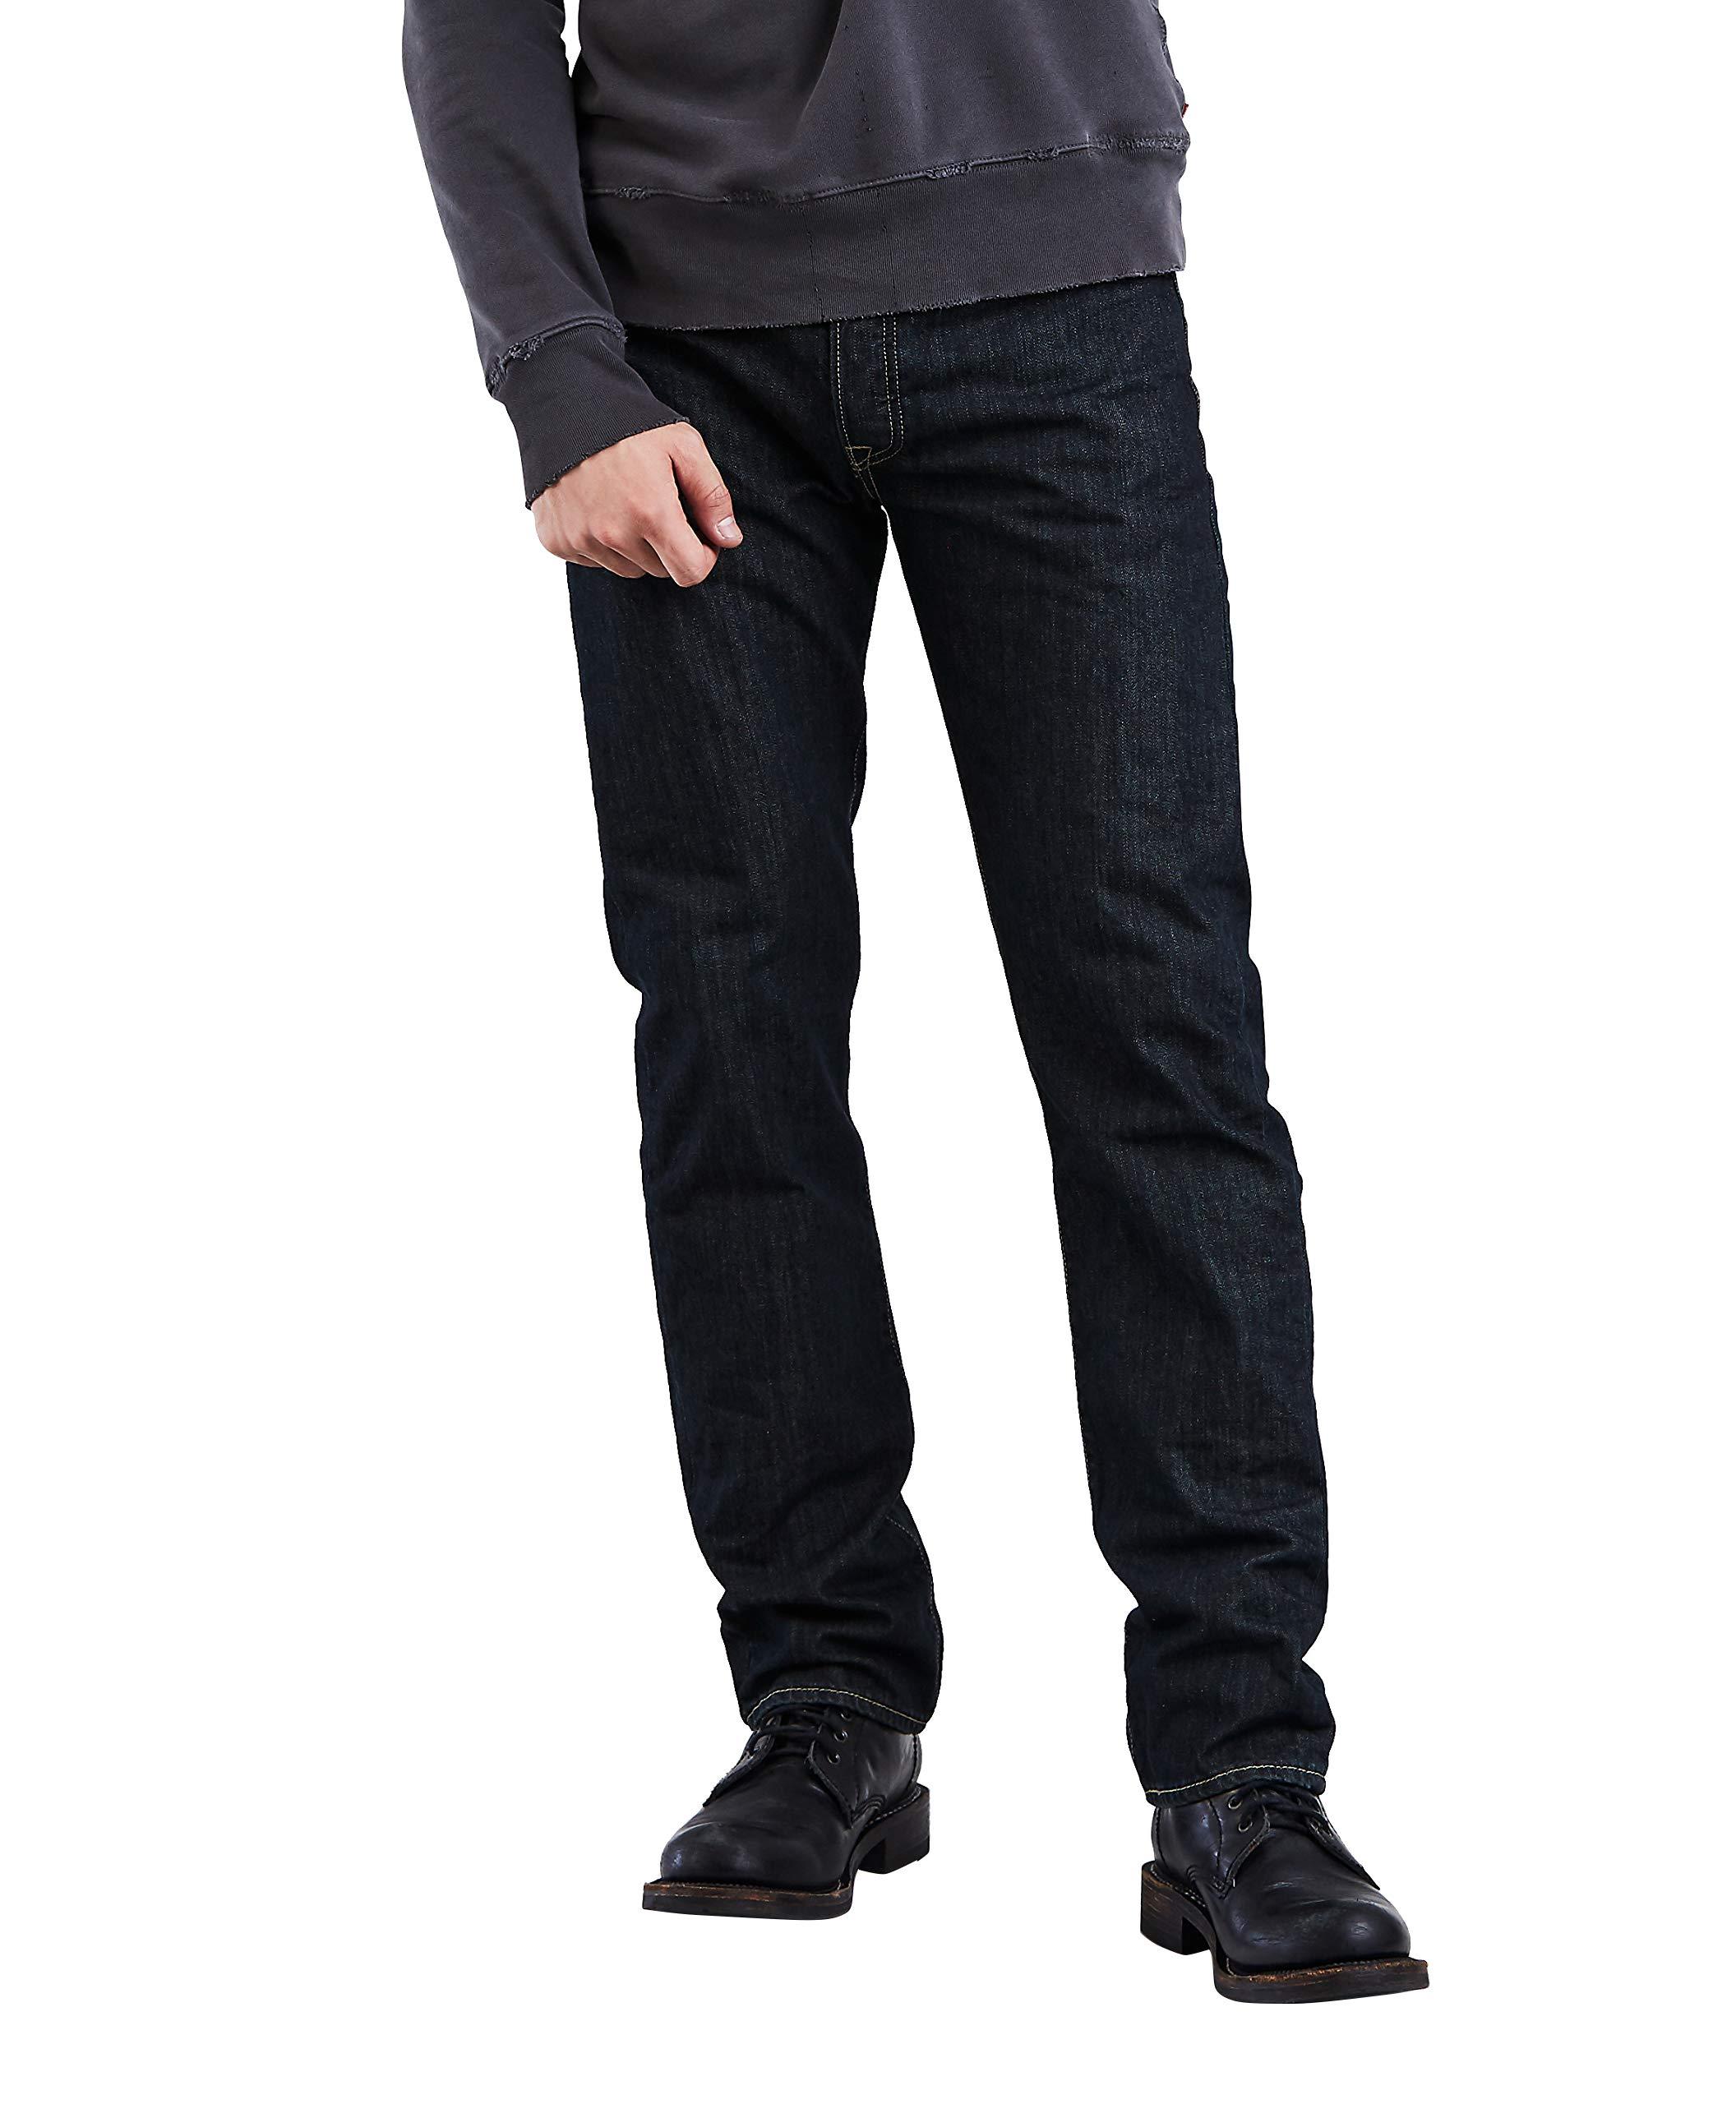 Levi's Men's 501 Original Fit Jean, Clean Rigid, 36x32